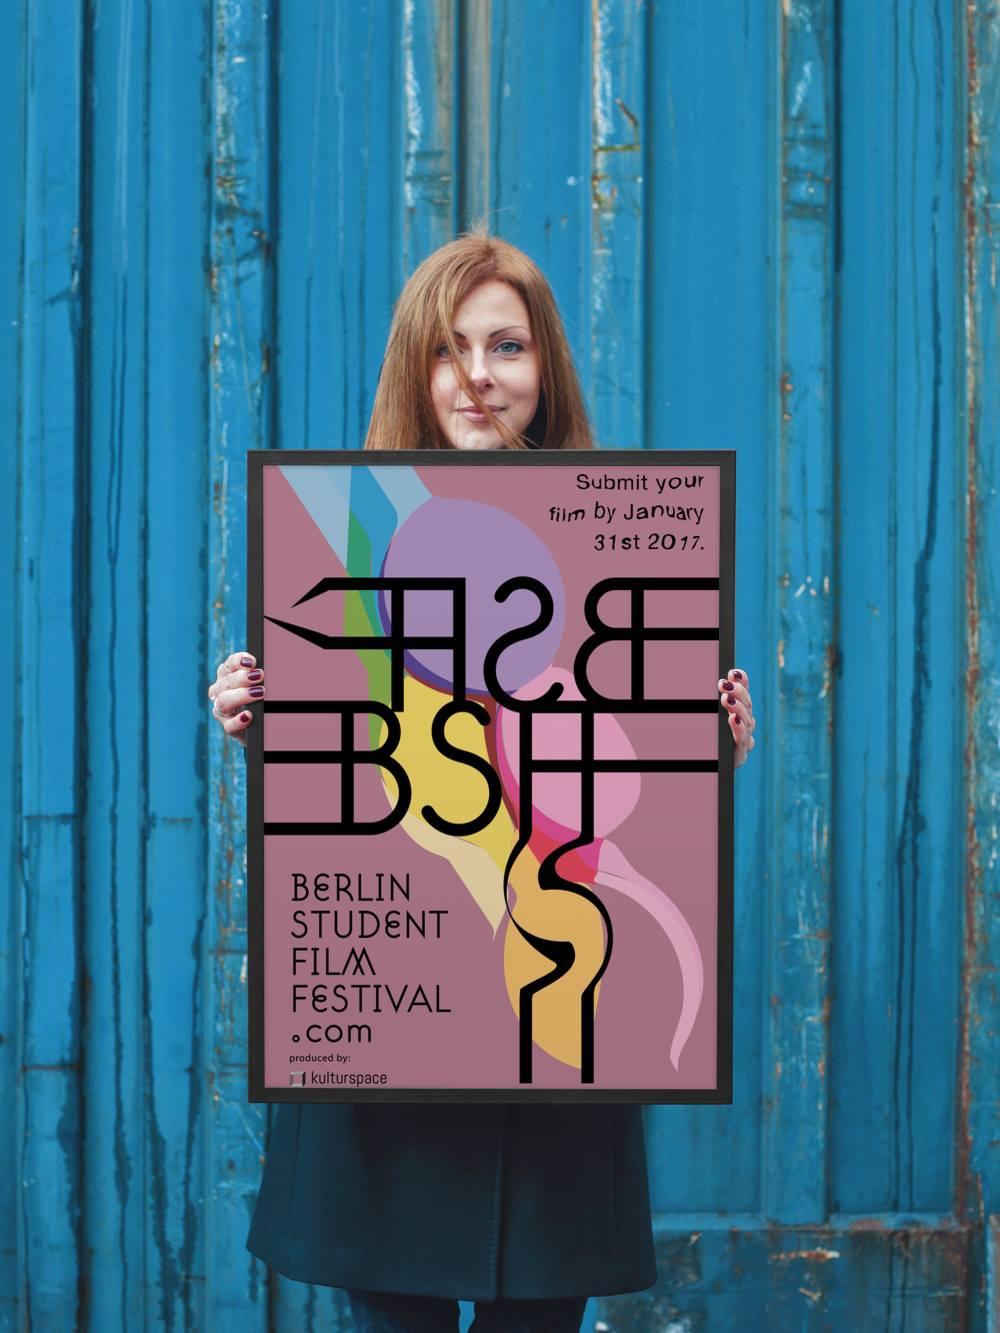 berlin student film festival